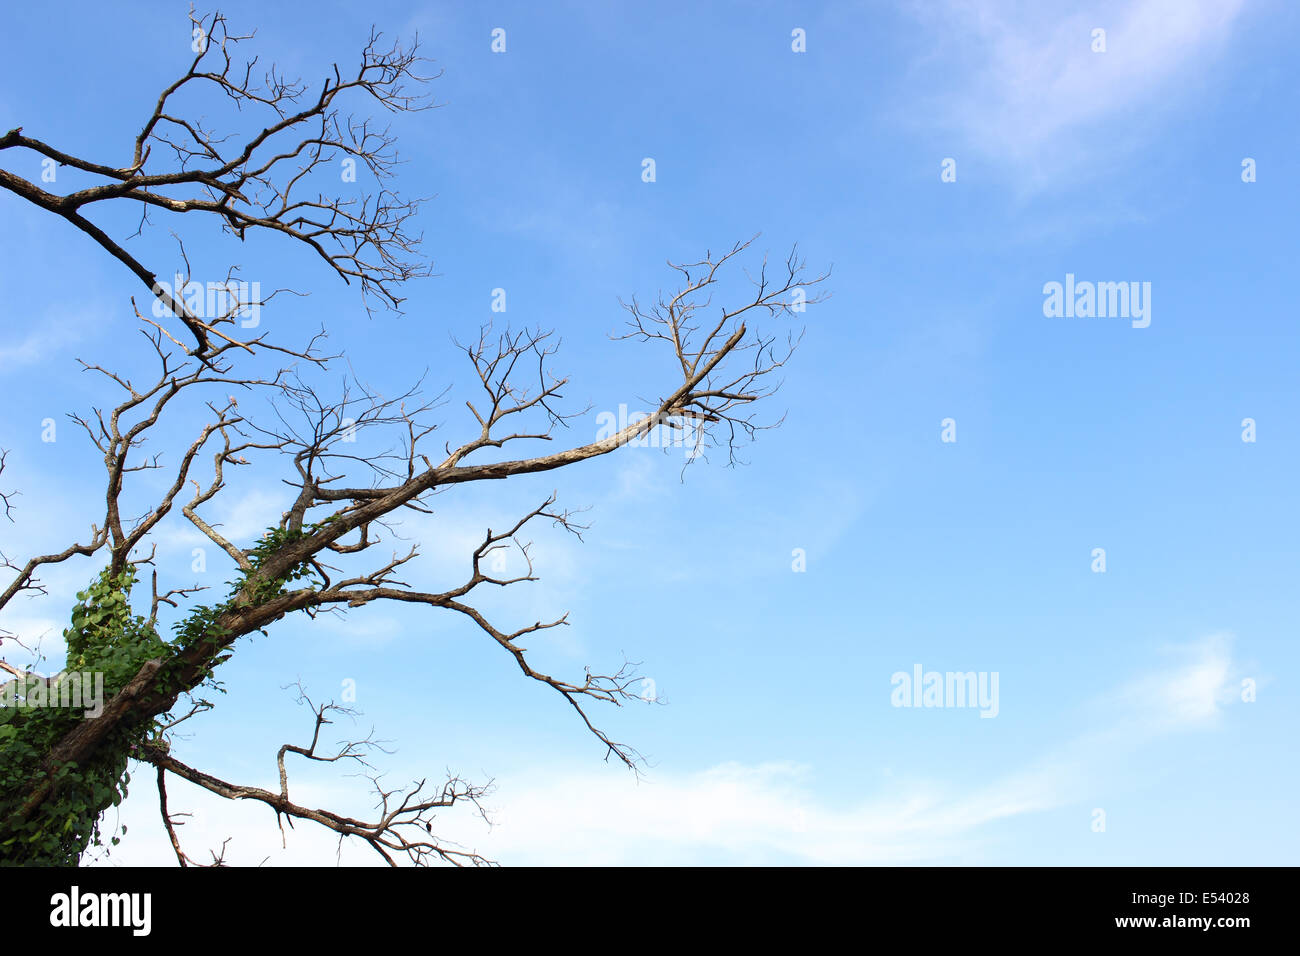 Leafless tree on blue sky - Stock Image